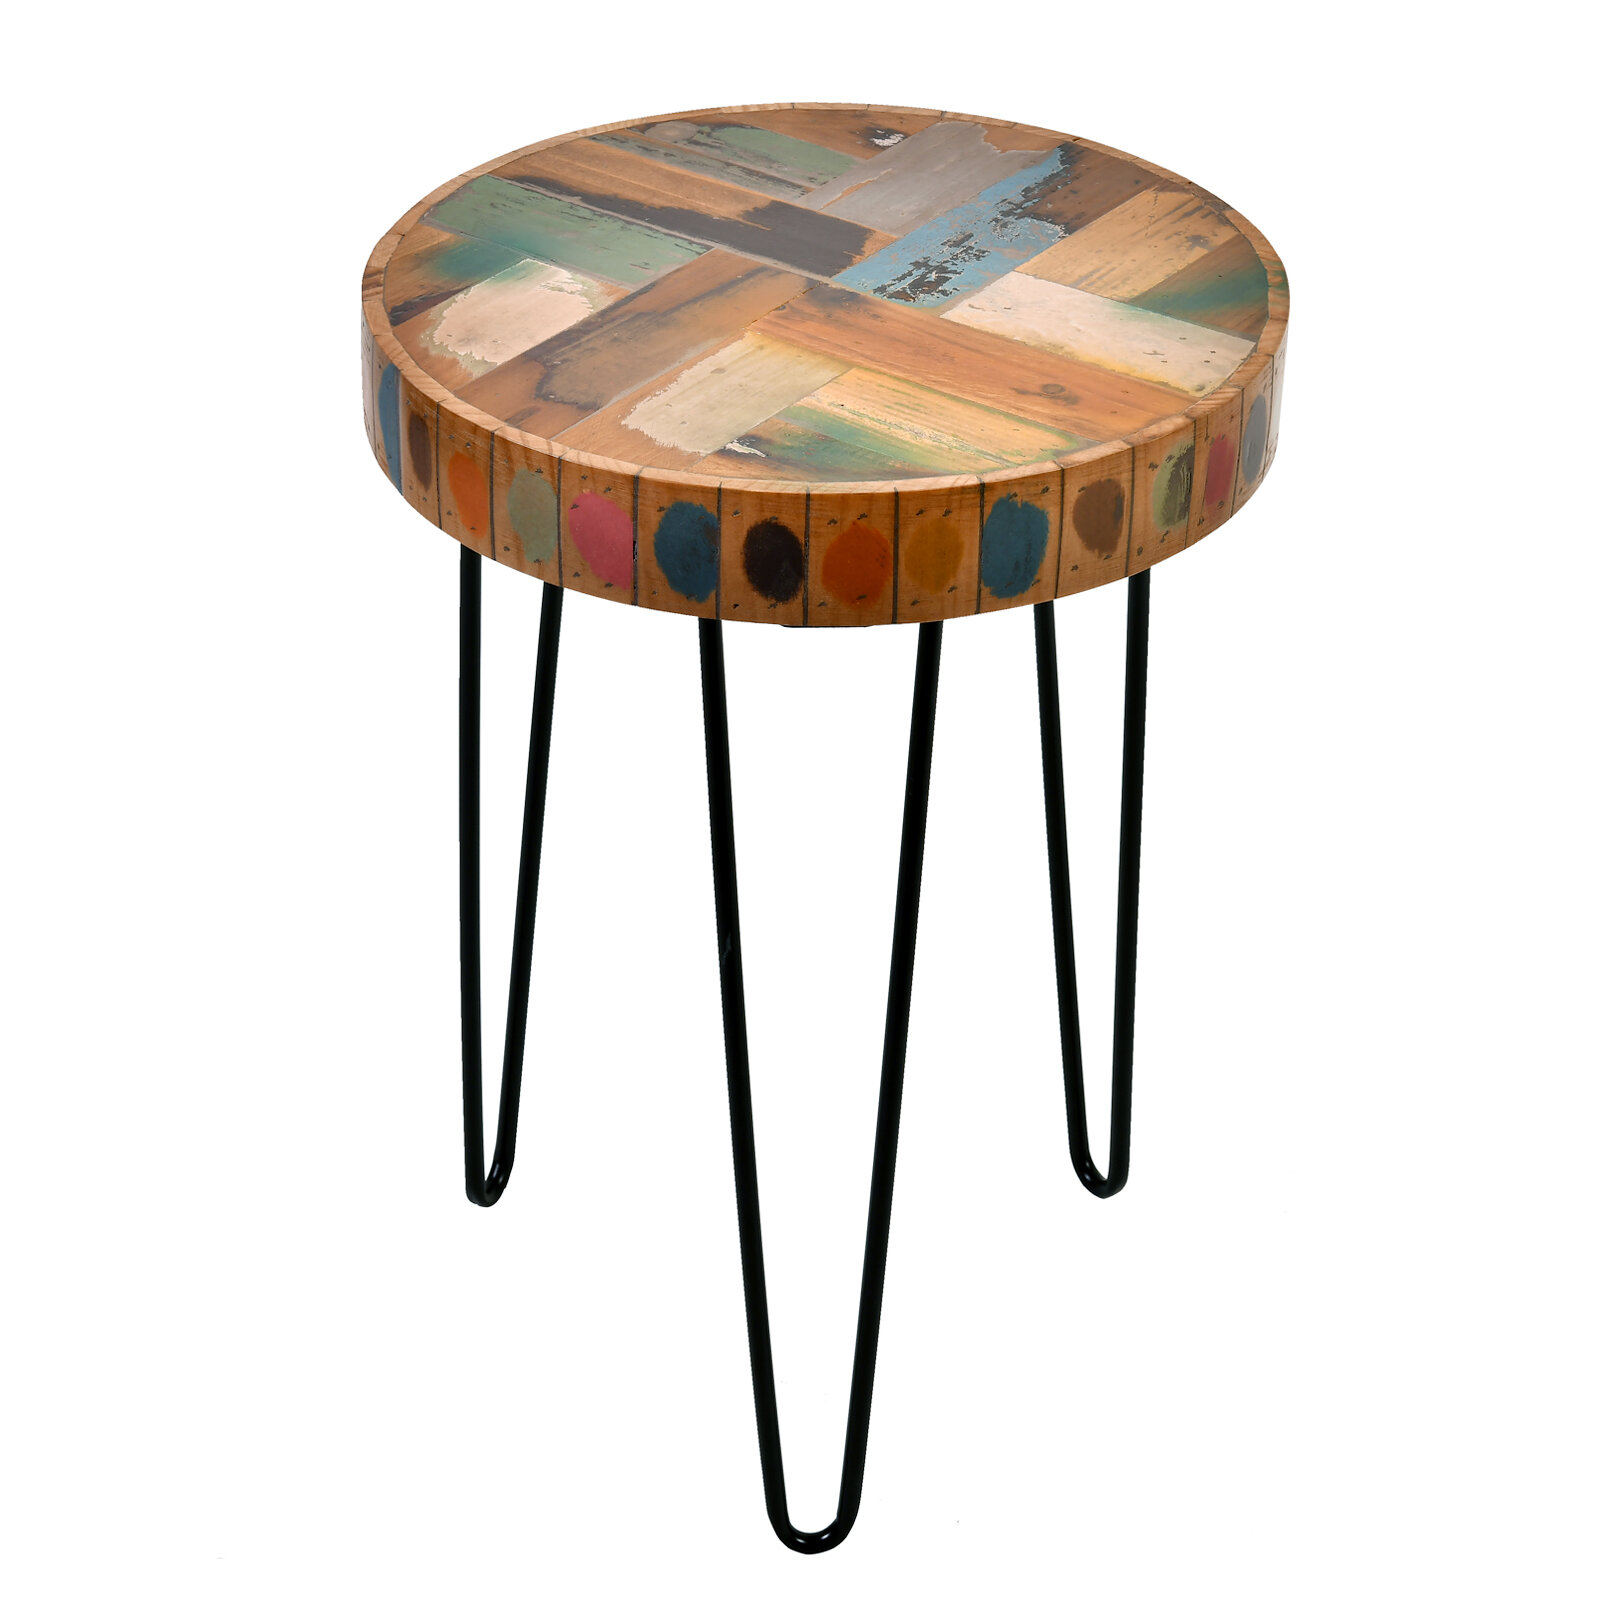 Midcentury Nightstand End Side Tables You Ll Love In 2021 Wayfair